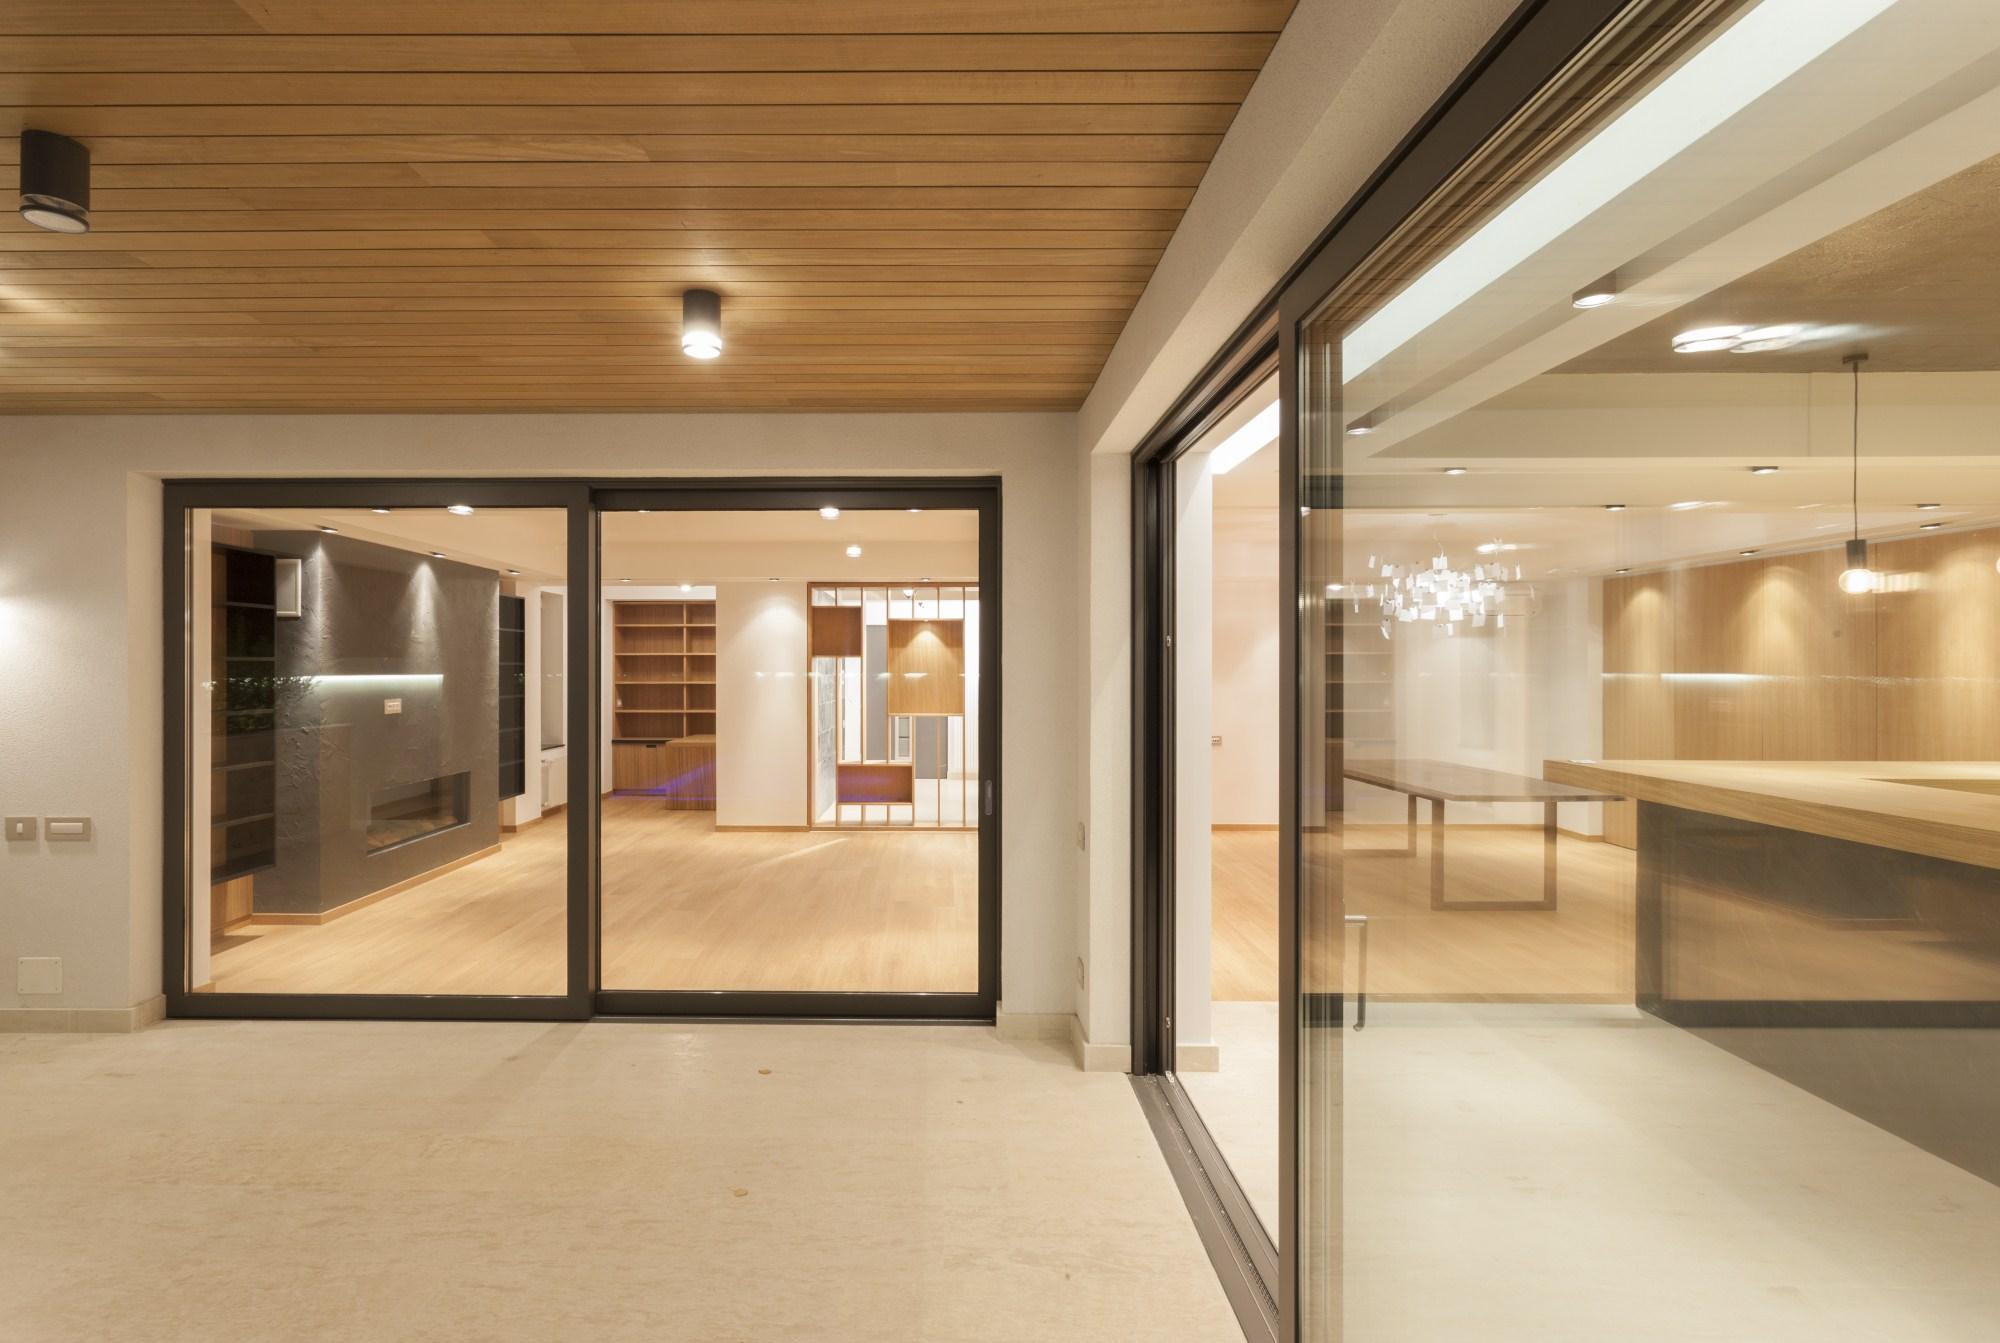 https://nbc-arhitect.ro/wp-content/uploads/2020/10/NBC-Arhitect-_-interiors-_-Vila-Pipera-_-Bucharest-Romania-_-interior-design-view_6.jpg